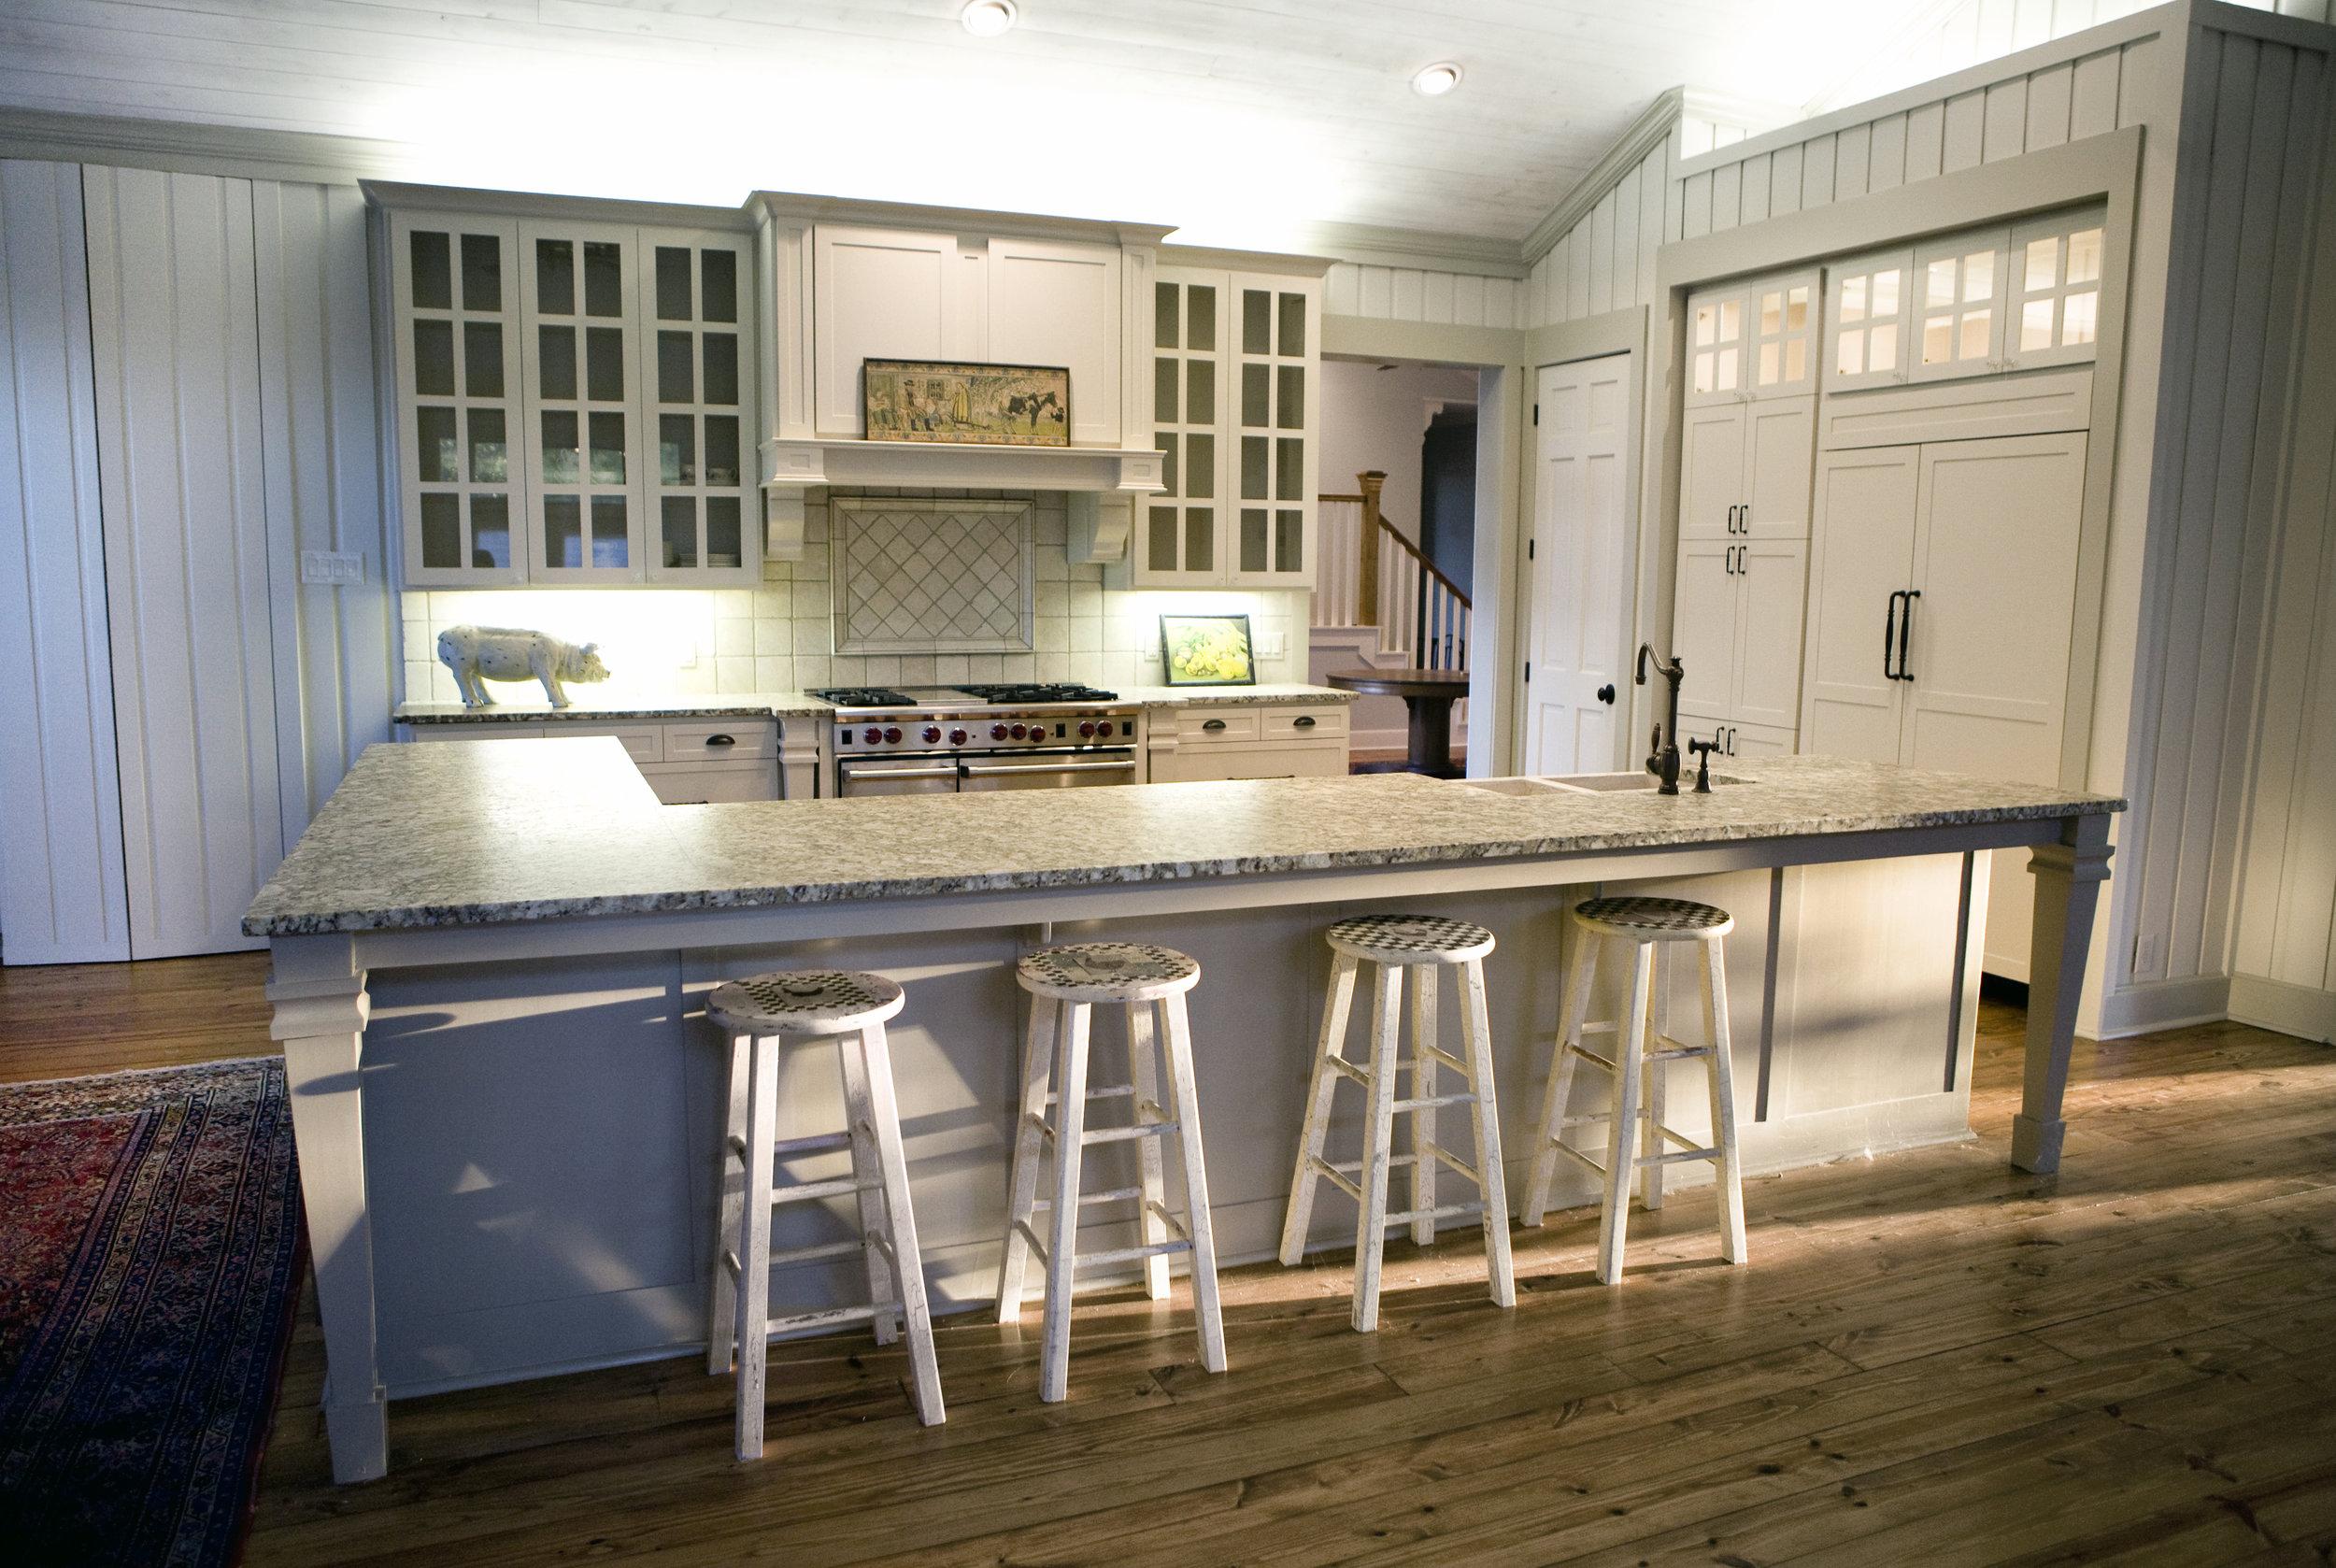 Kitchen Design: Custom Kitchen With Wood Cabinets